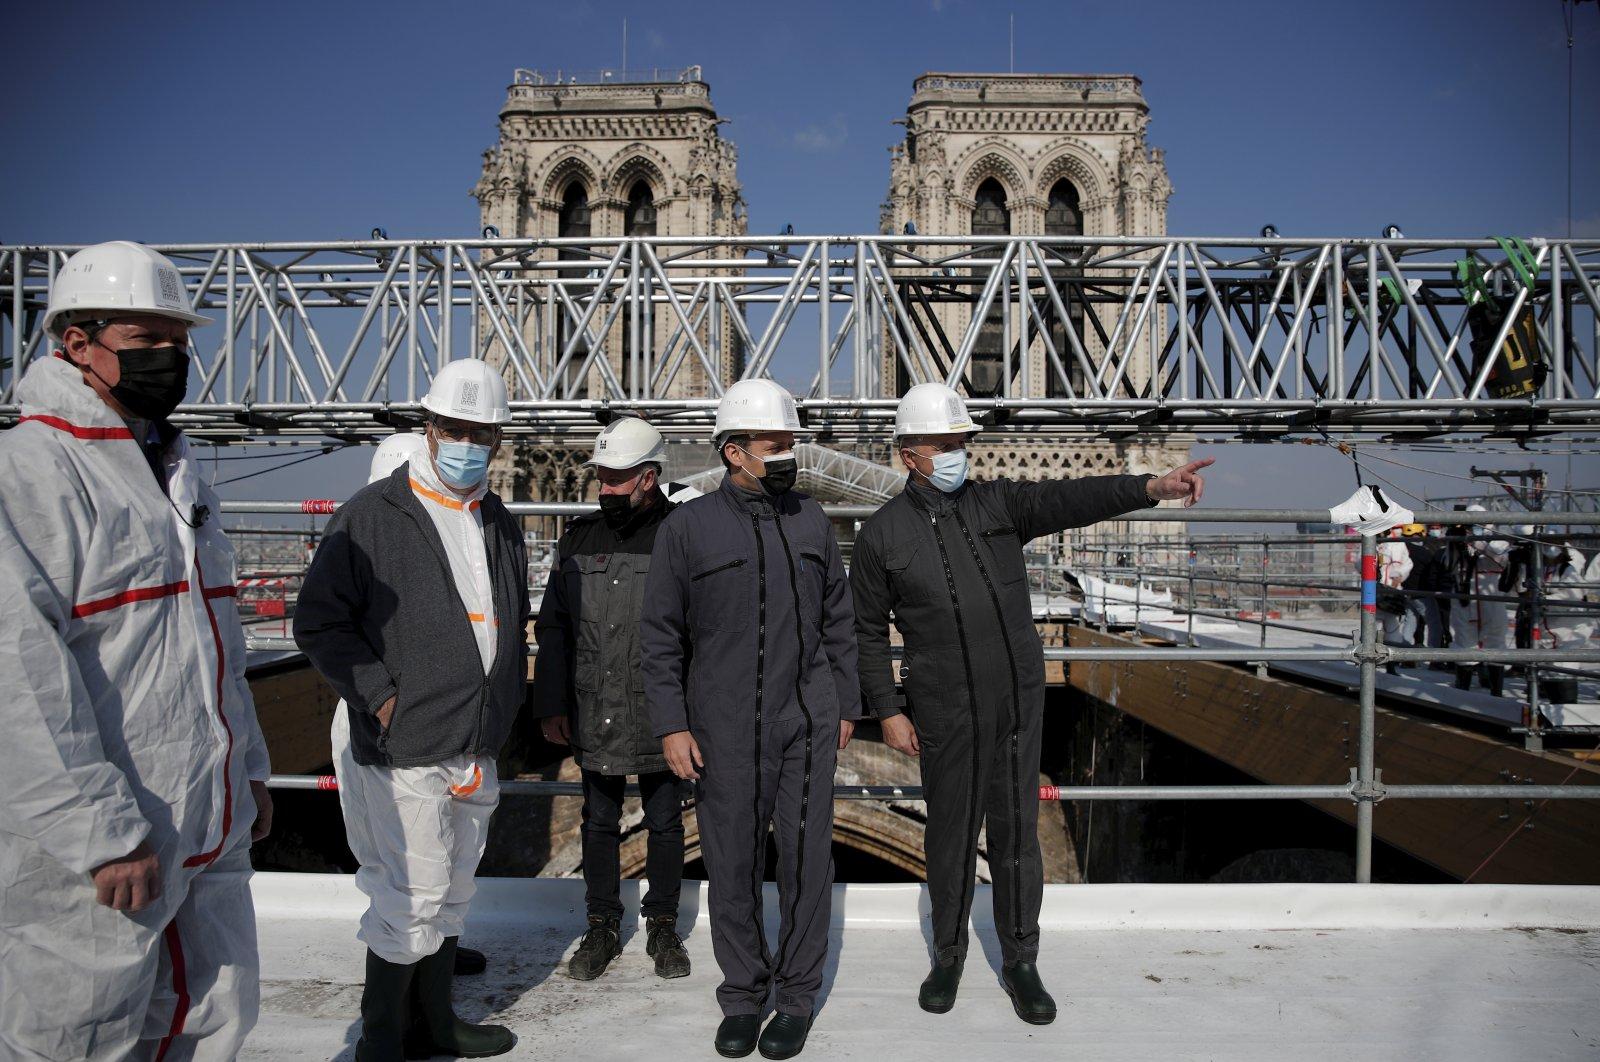 French President Emmanuel Macron (C) visits the reconstruction site of the Notre Dame cathedral, Paris, France, April 15, 2021. (Pool via AP)